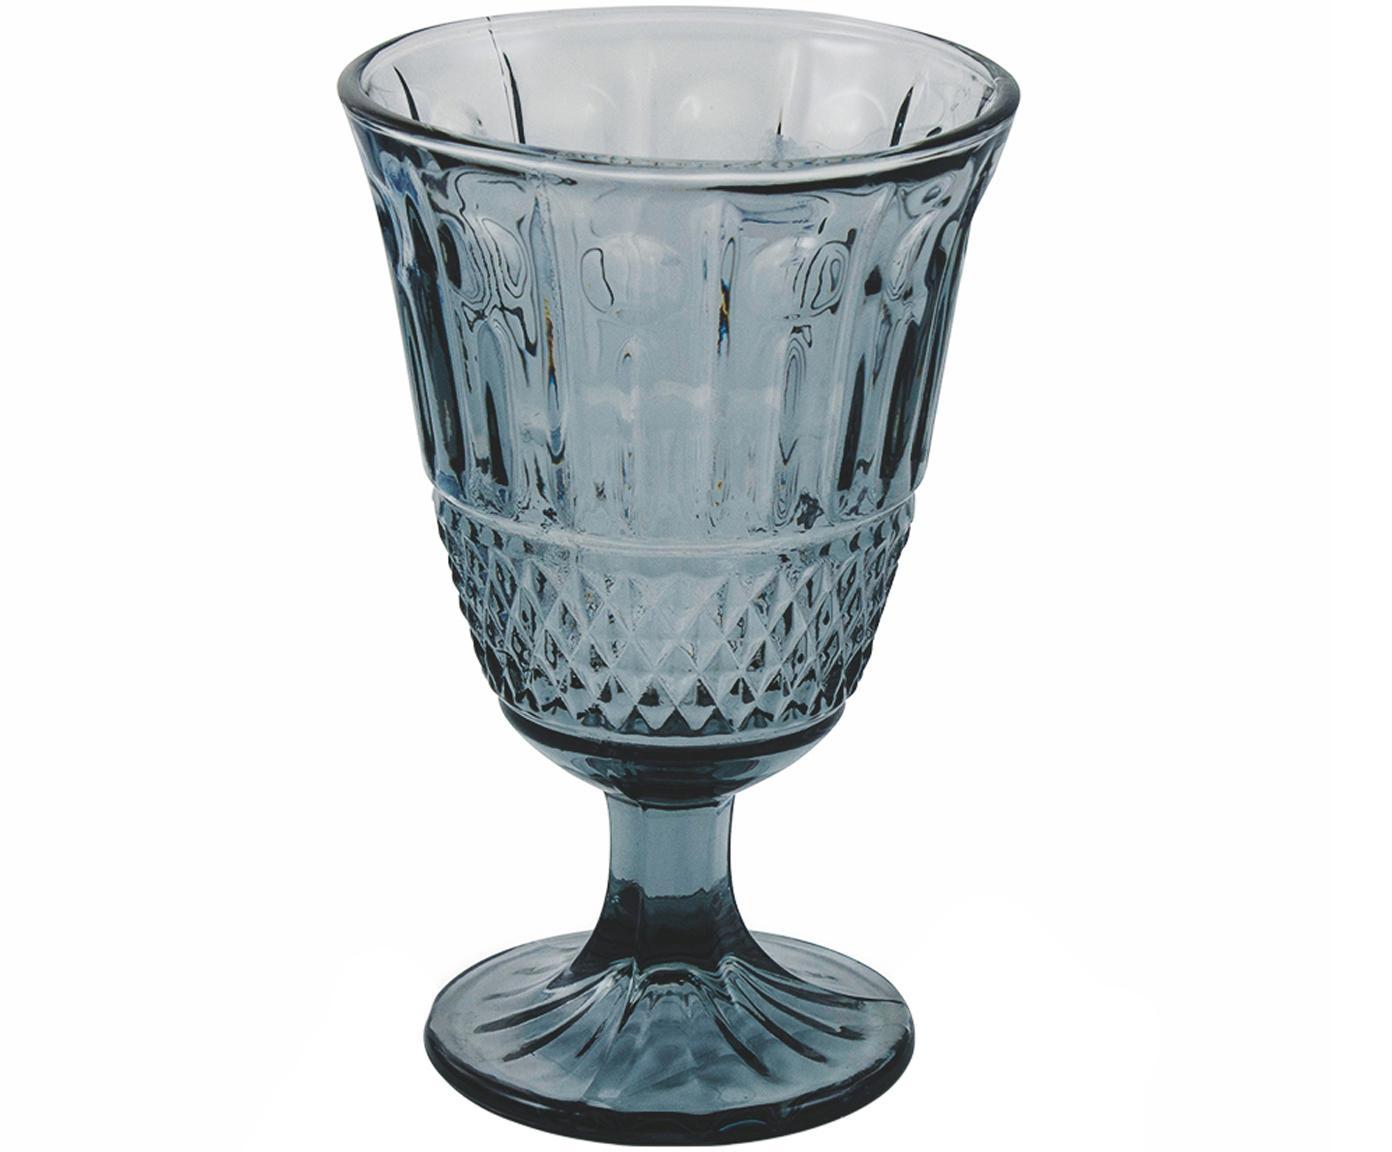 Wijnglazenset Elegance in blauw, 6-delig, Glas, Blauw, Ø 9 x H 14 cm